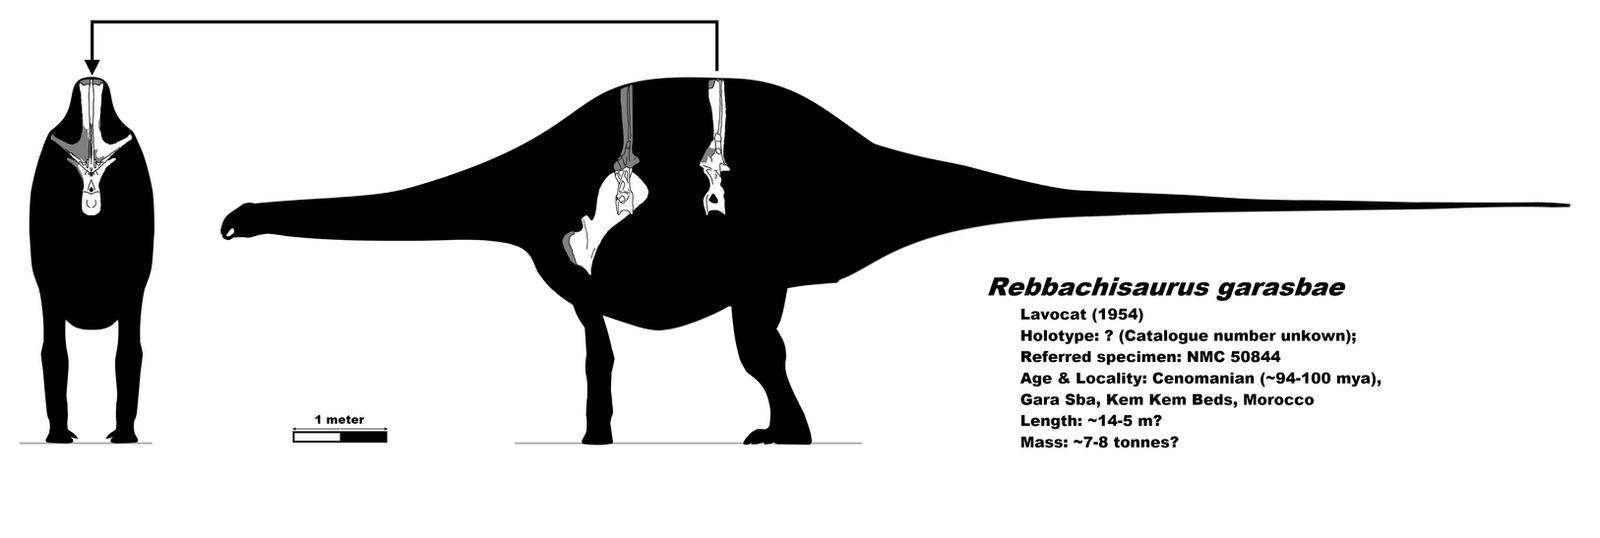 Rebbachisaurus skeletal by palaeozoologist